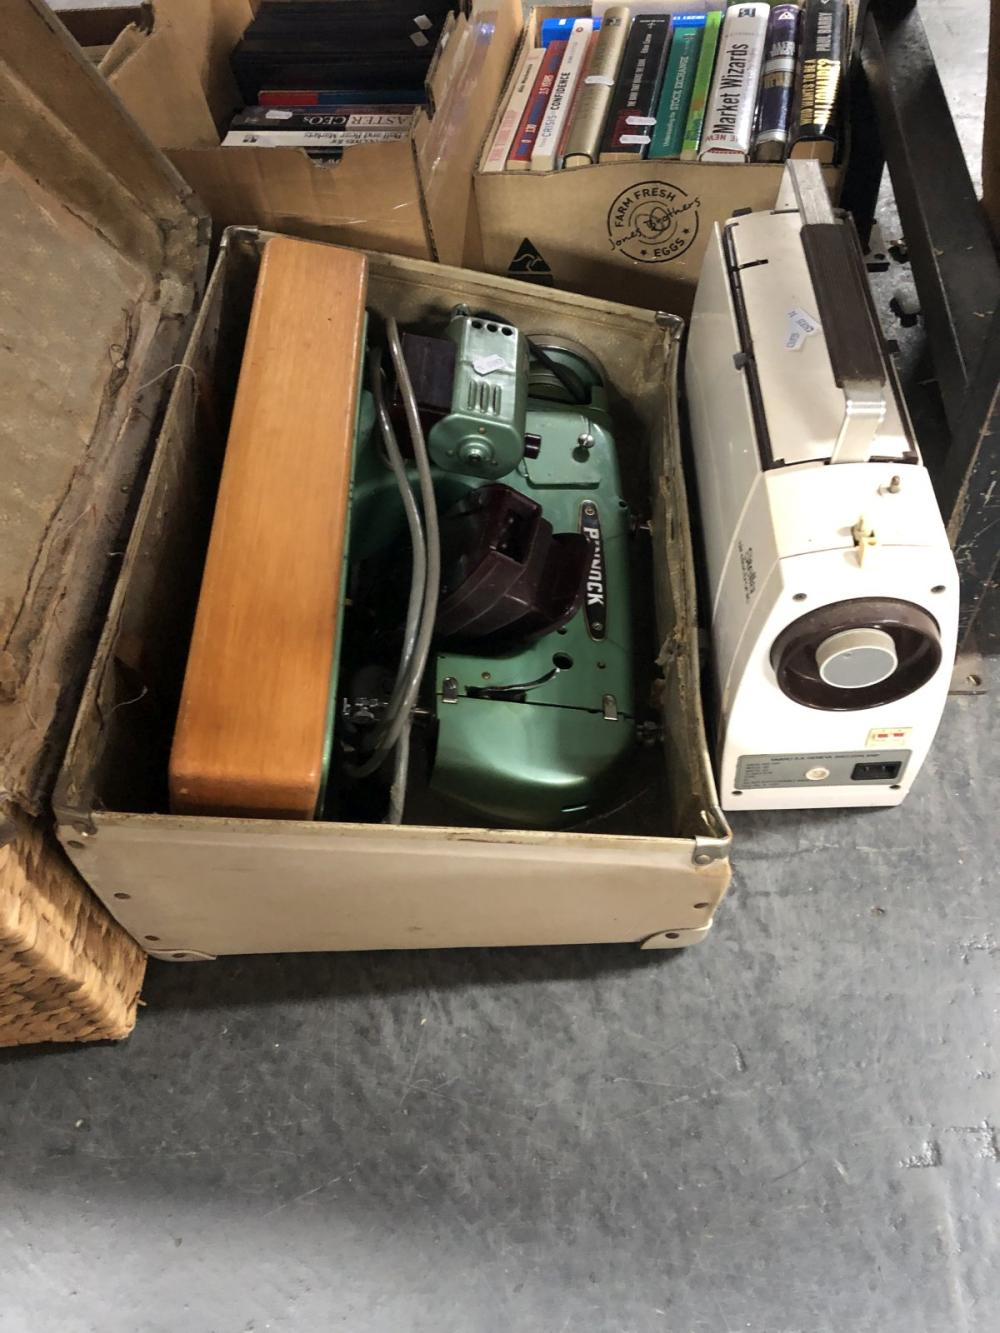 Pinnock Sewing Machine in Suitcase, an Elna Sewing Machine & a Crochet Thread & Doilies